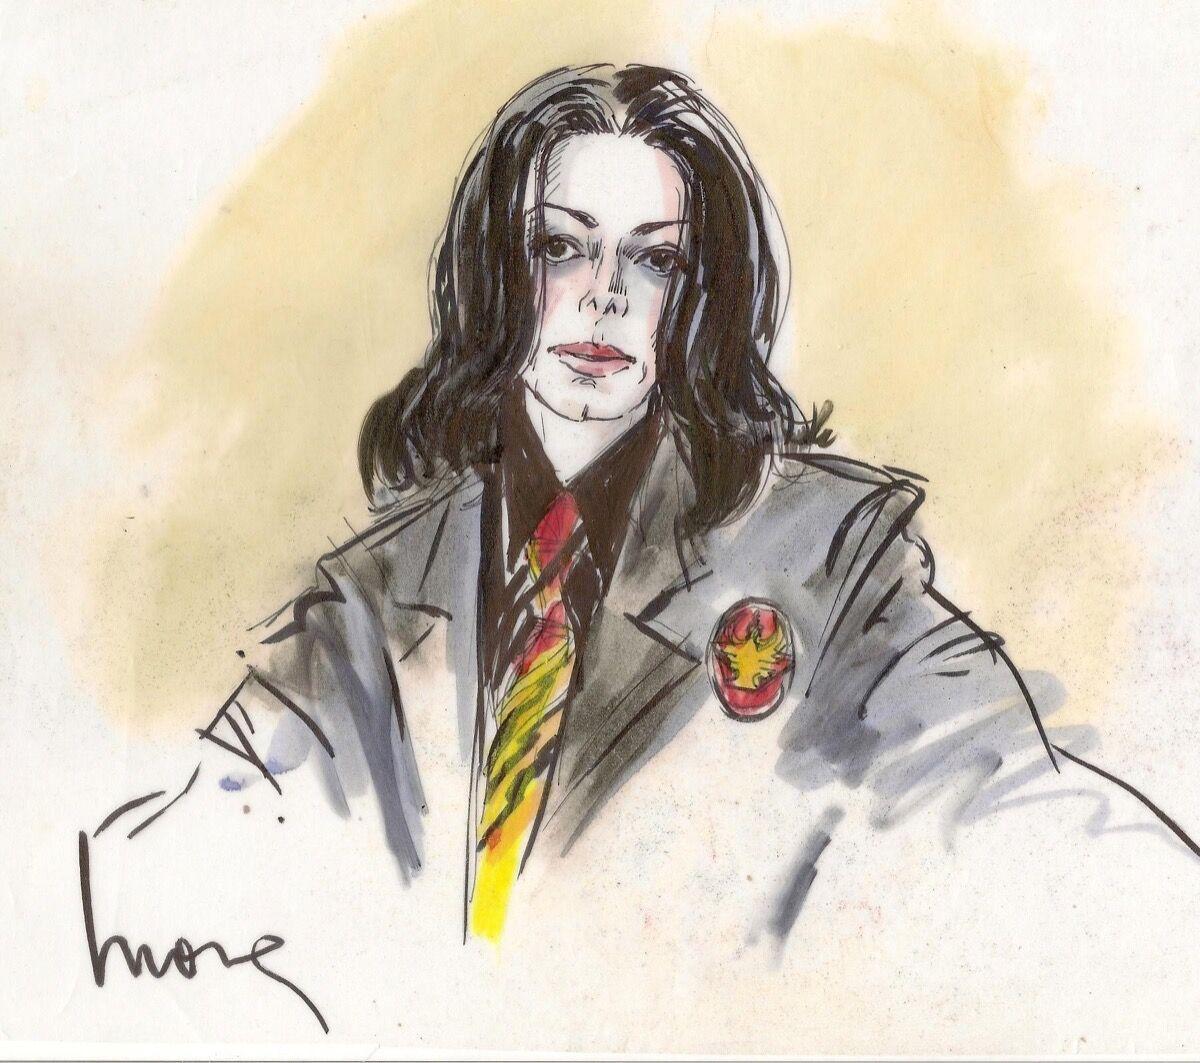 Illustration of Michael Jackson by Mona Shafer Edwards.